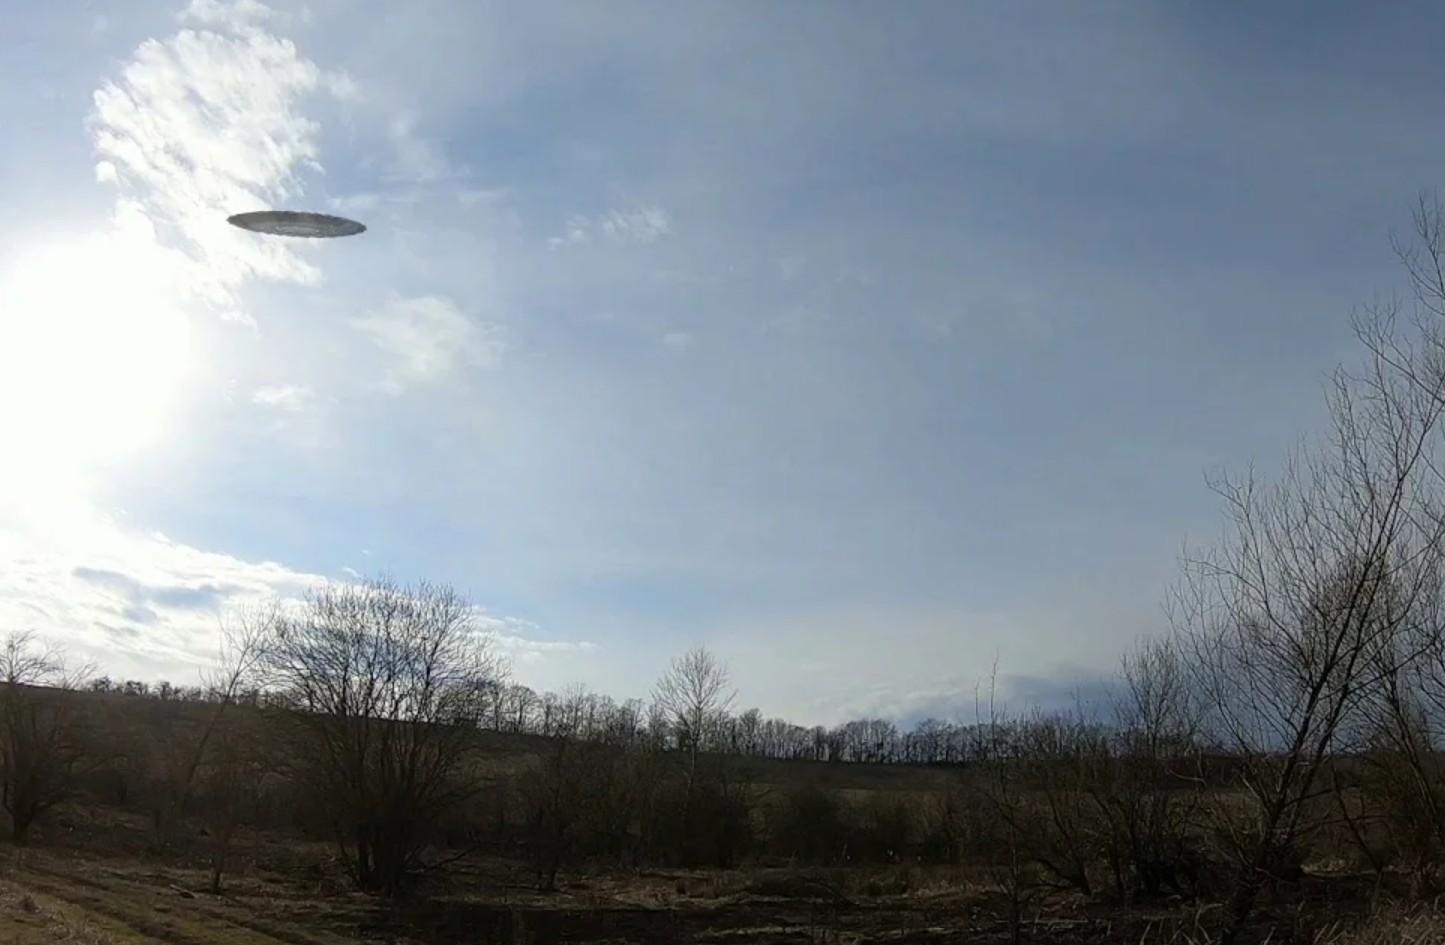 Случаи возникновения НЛО в Волгограде